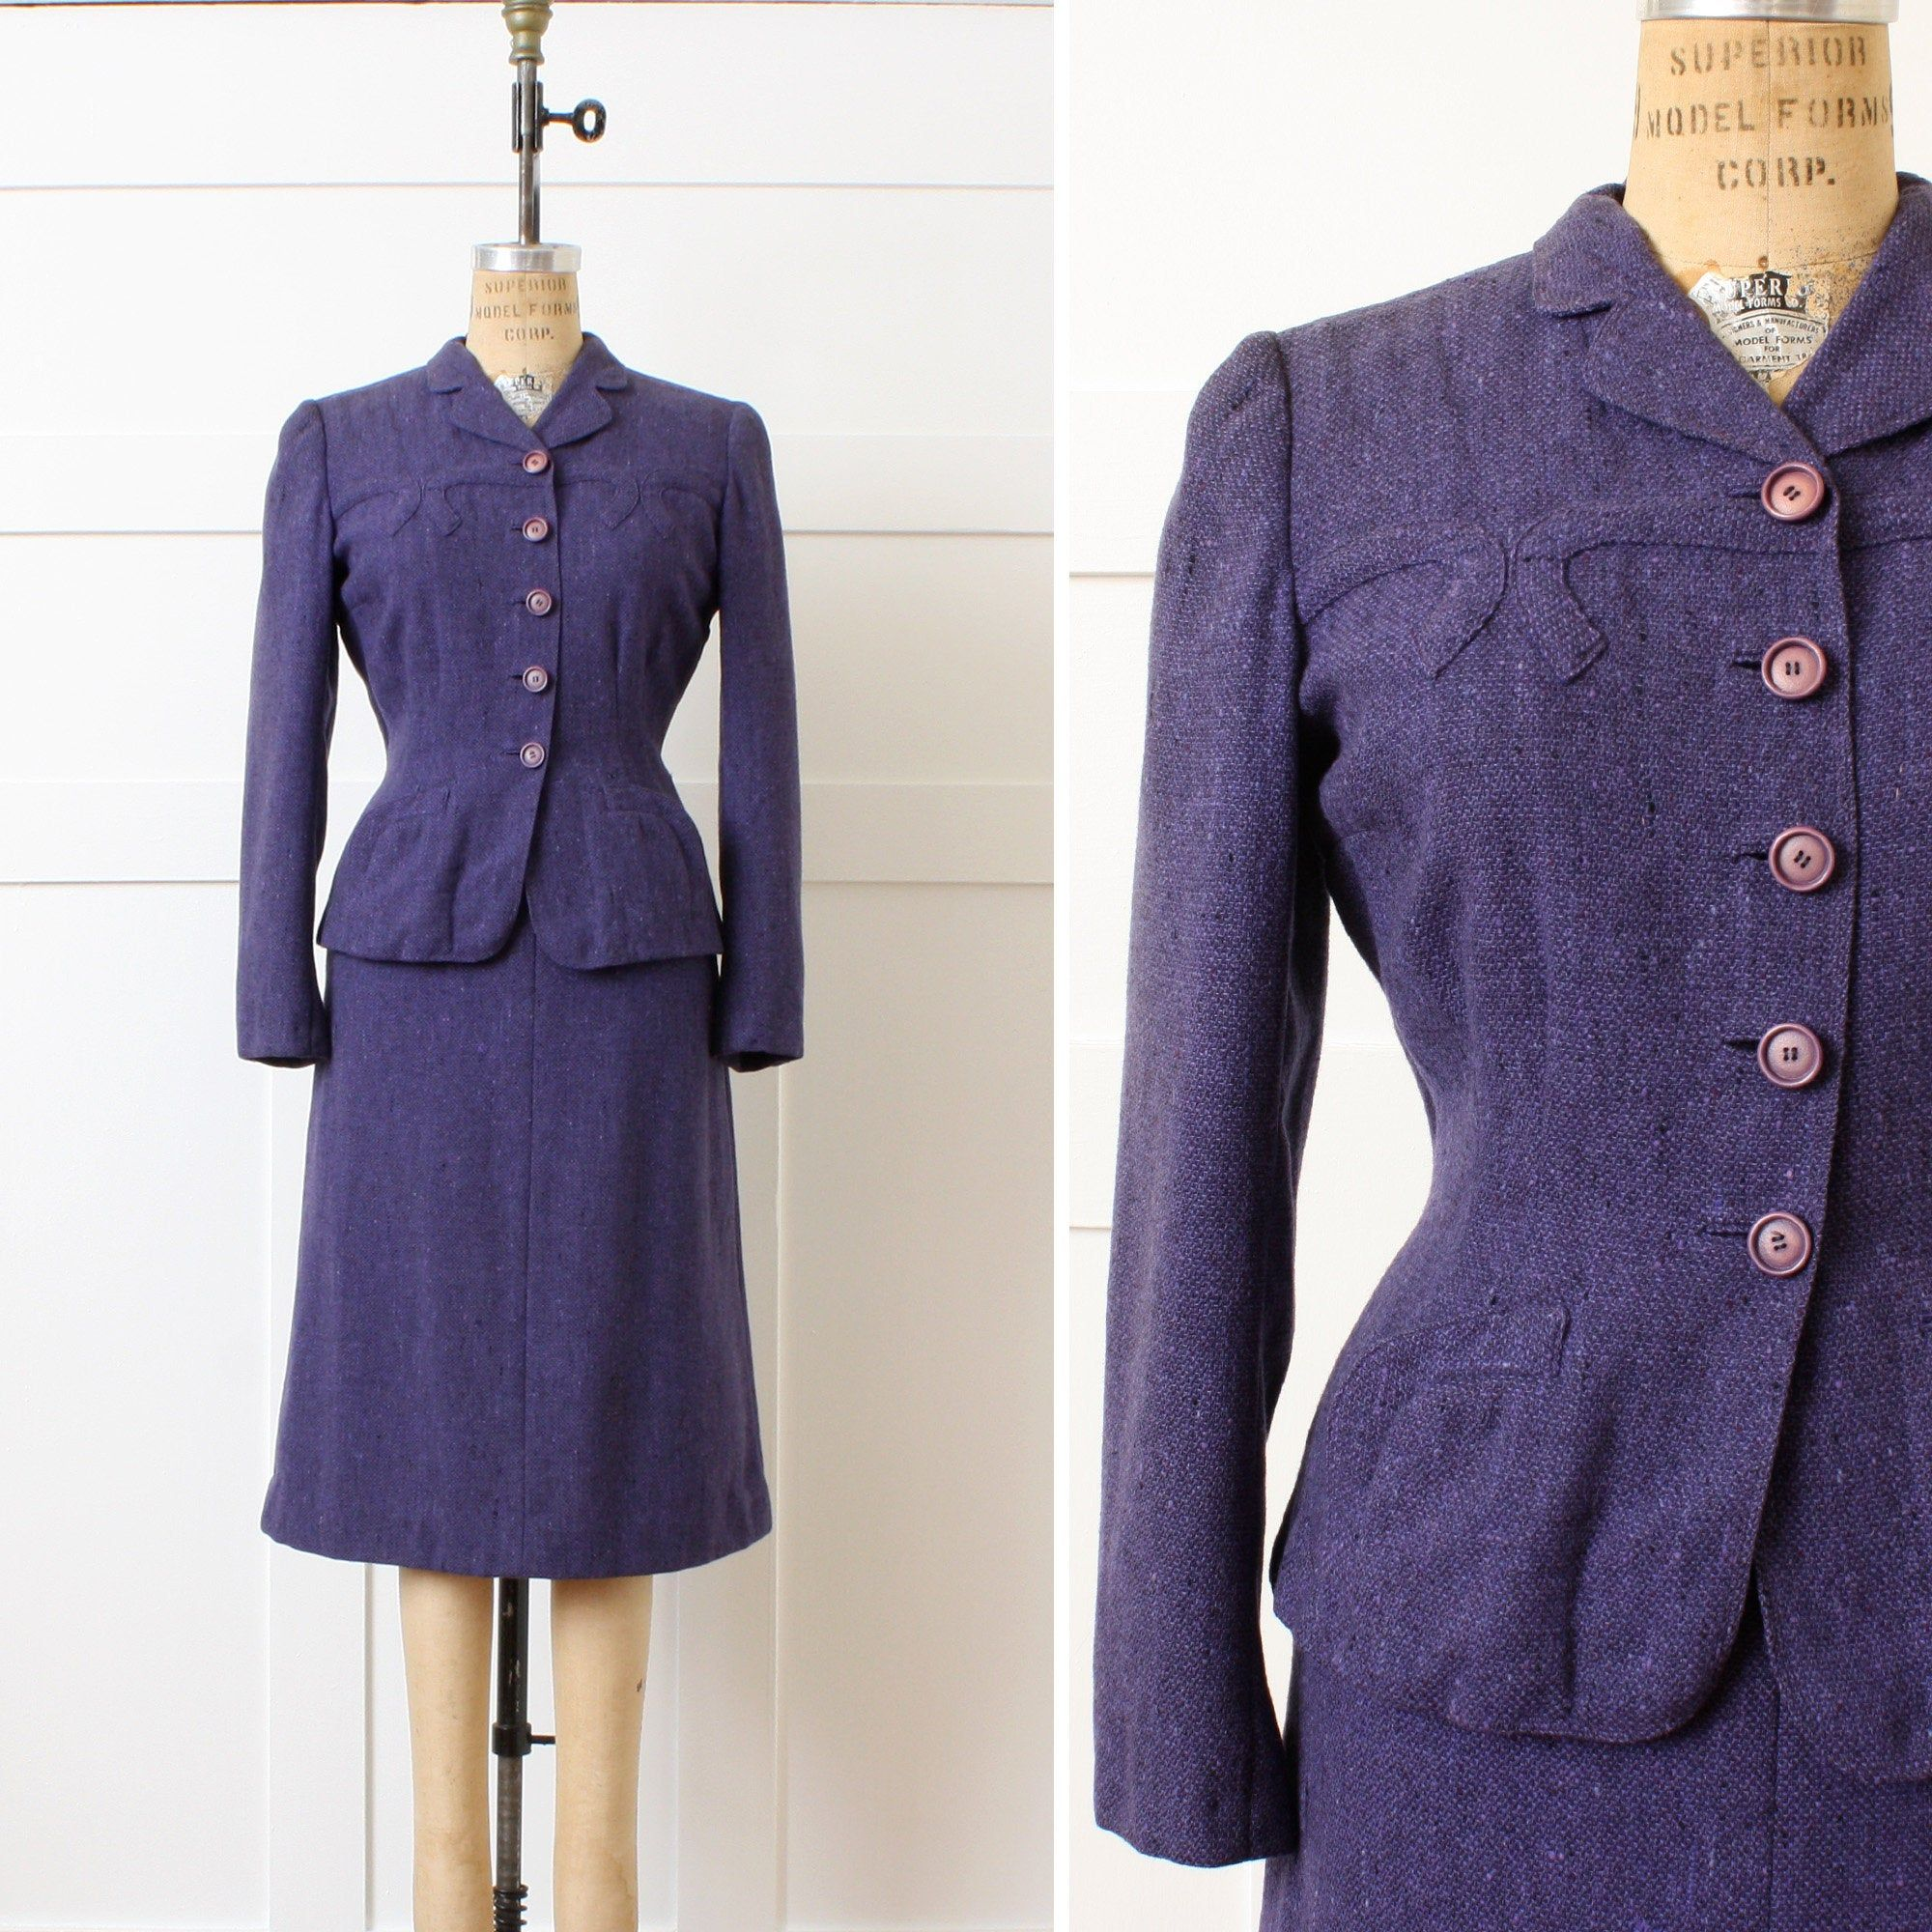 Vintage 1950s 1960s Green Handmade Skirt Suit Fits Medium Size 8